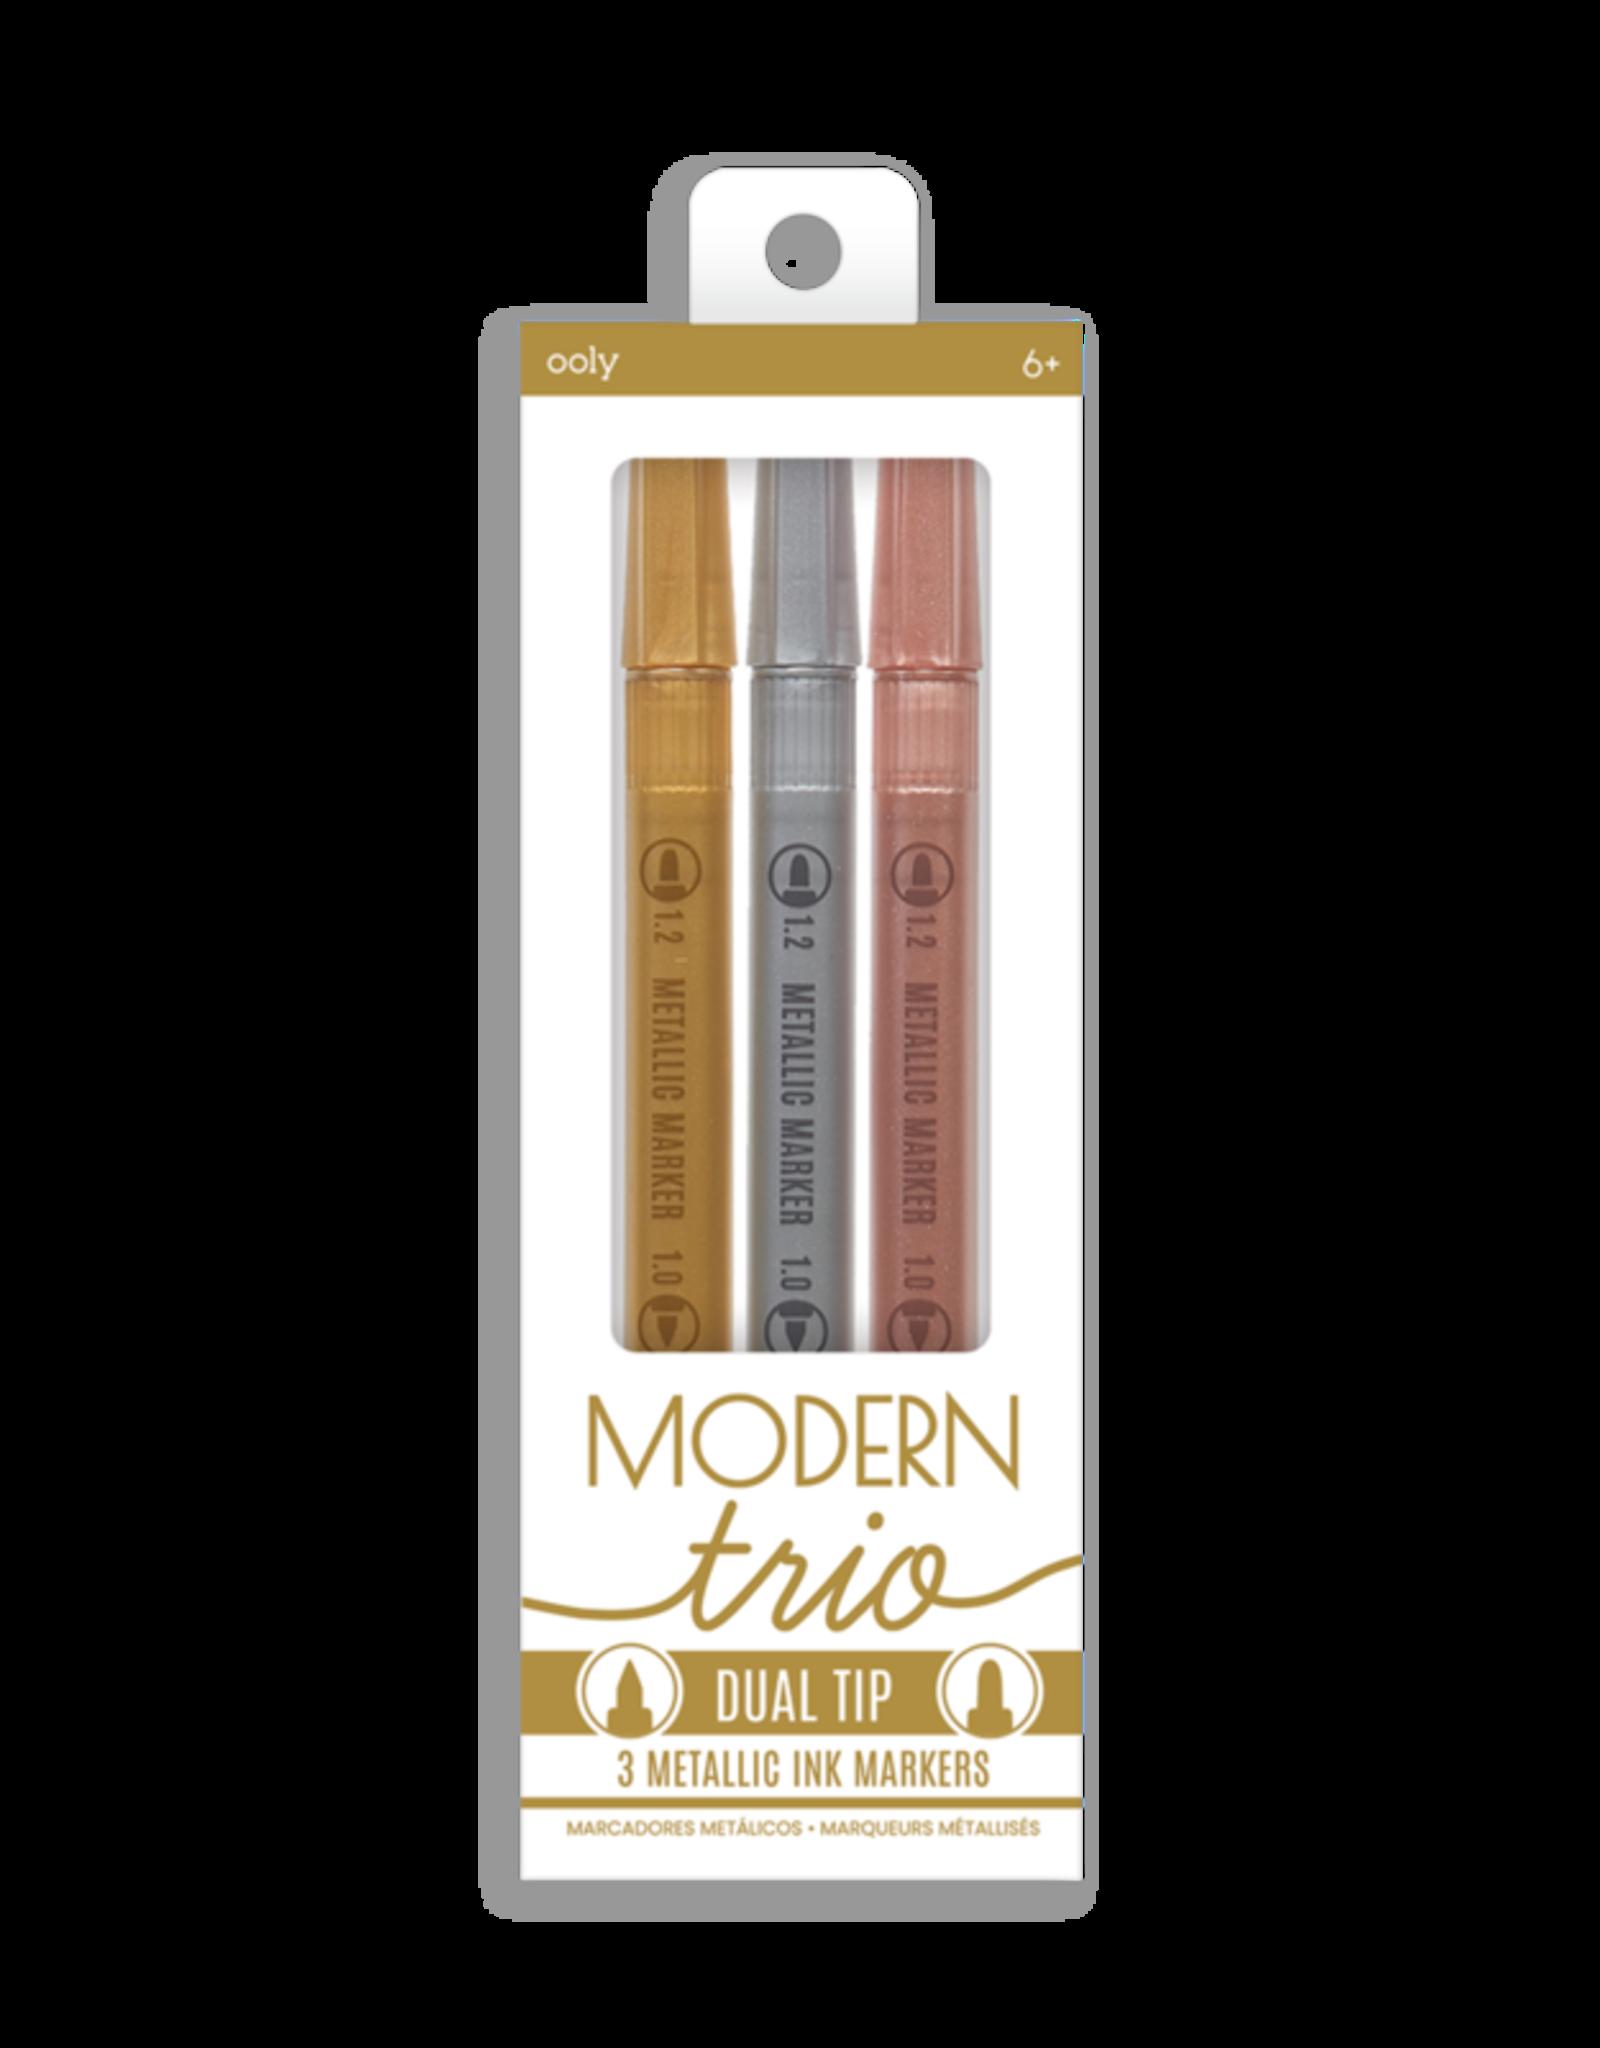 Ooly Modern Trio Dual Tip Metallic Markers